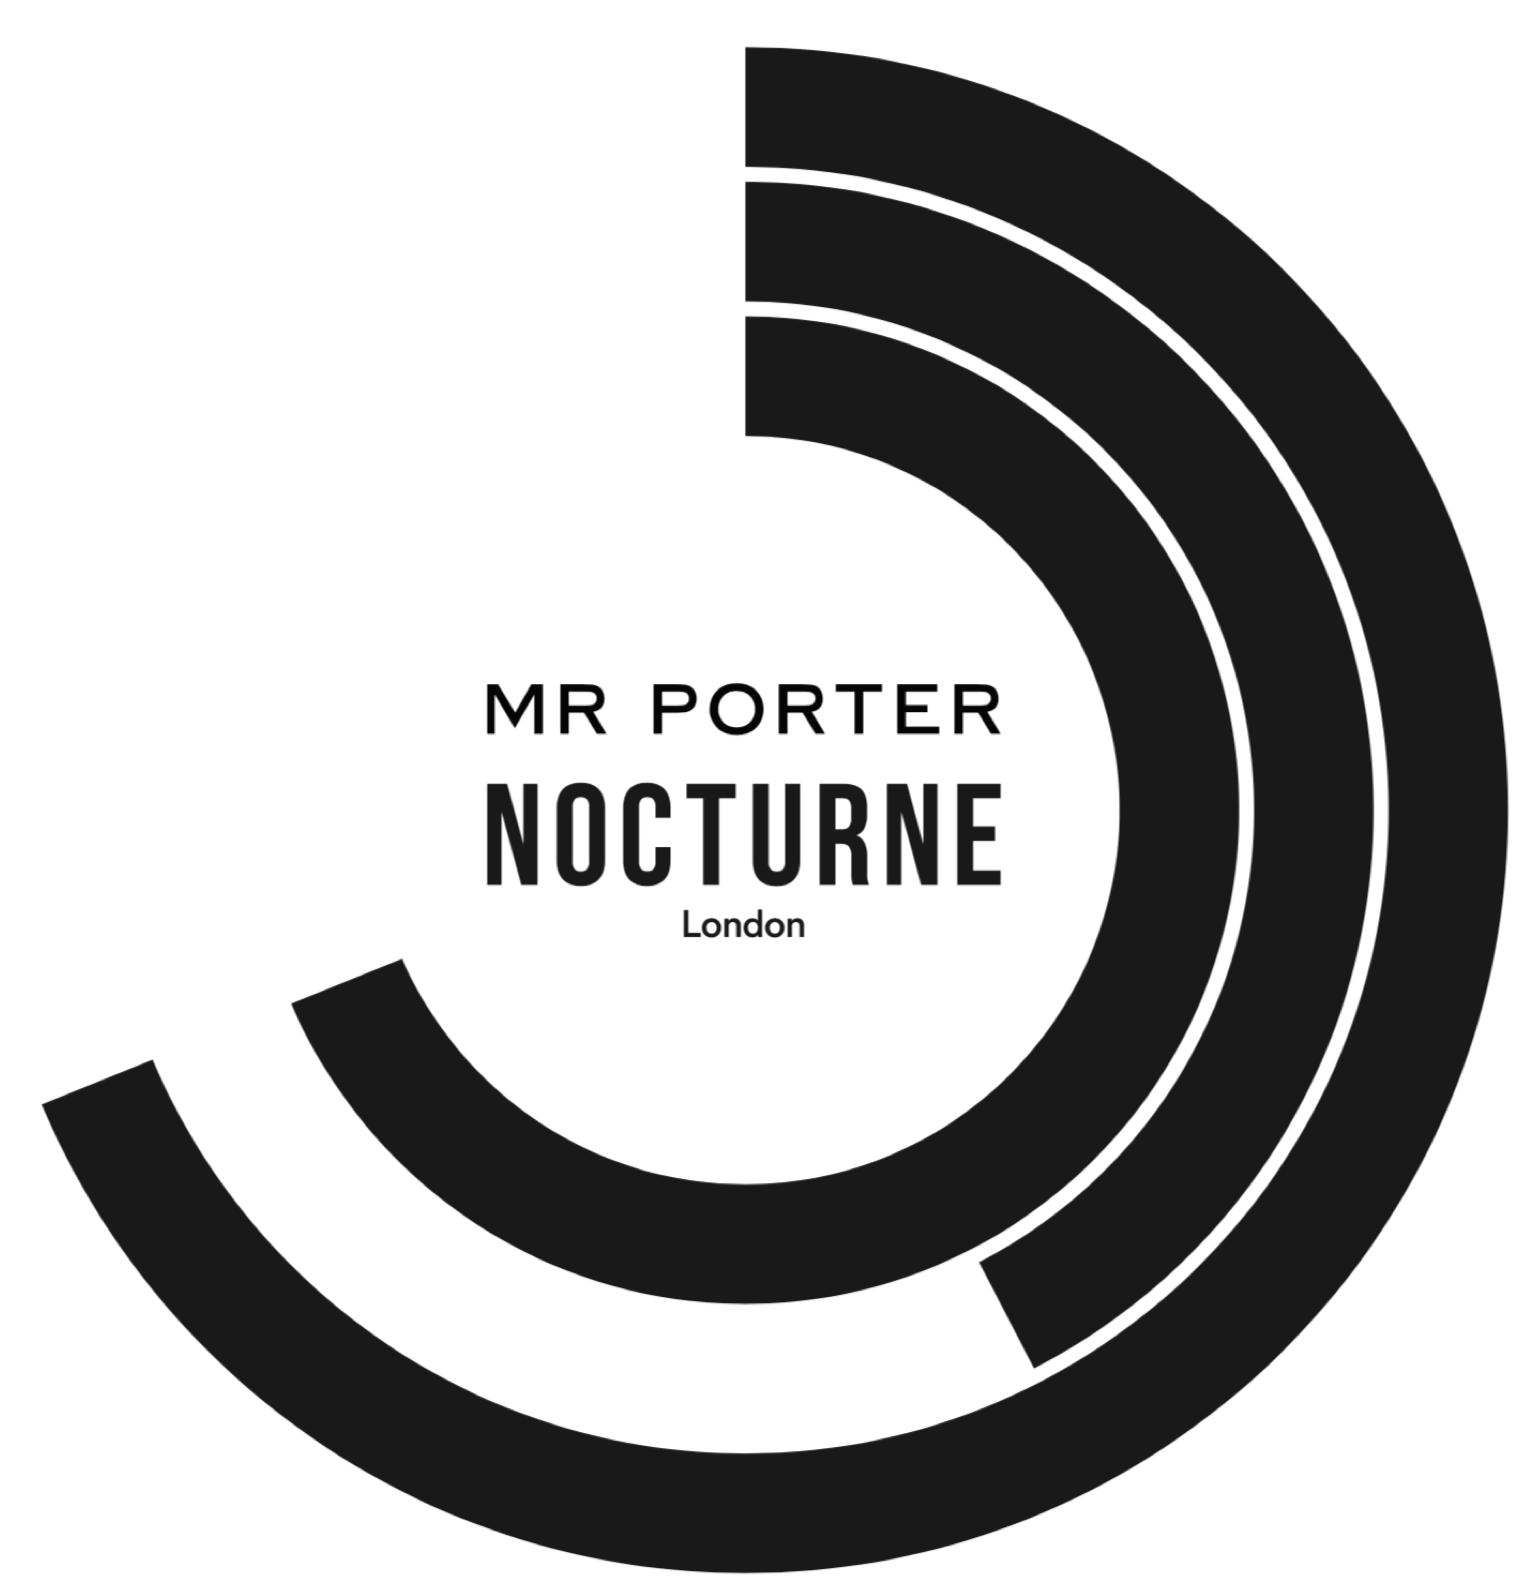 London Nocturne.png